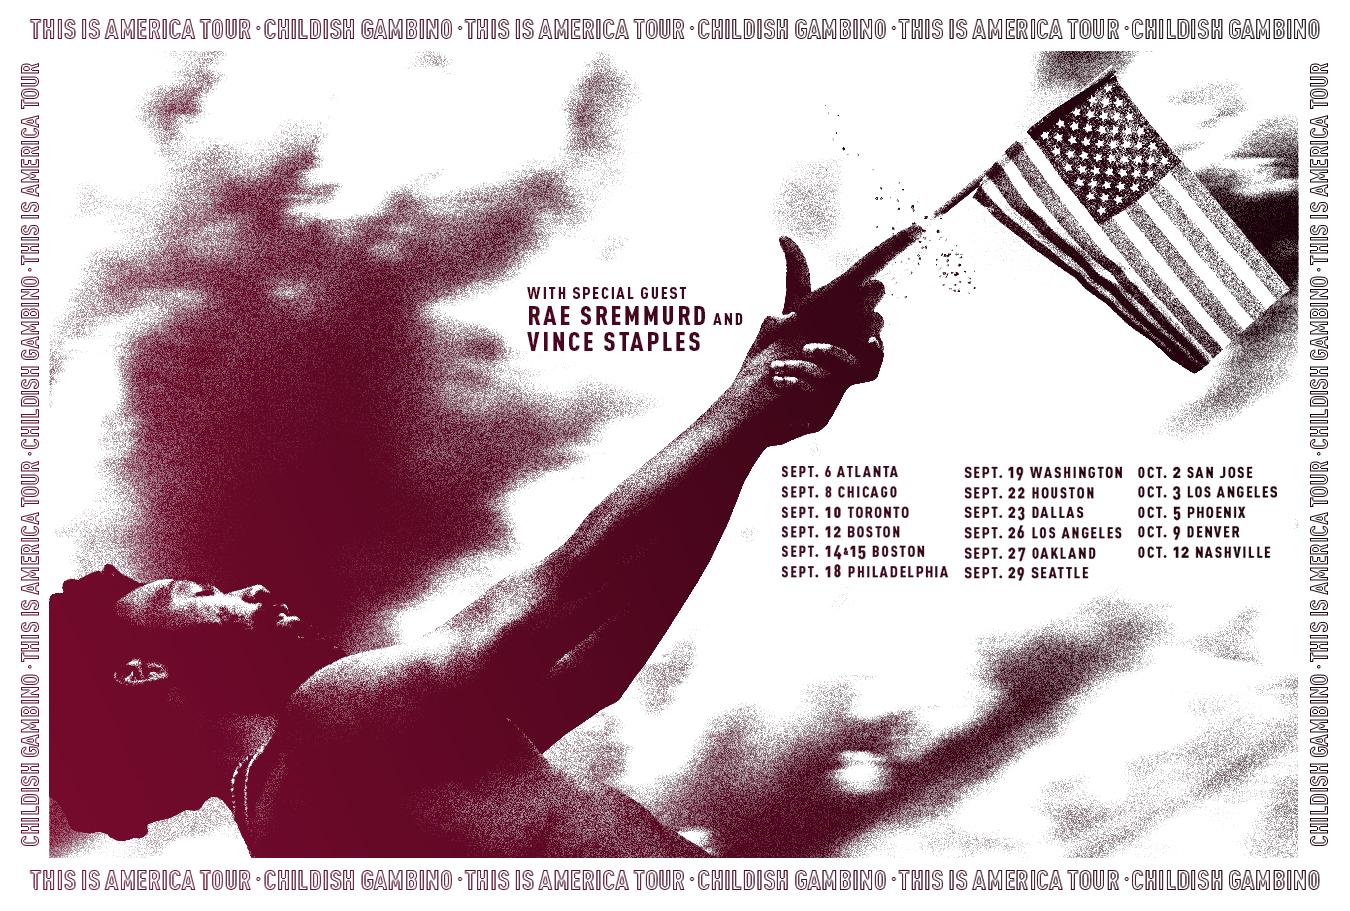 Digital Poster_ThisIsAmerica.jpg